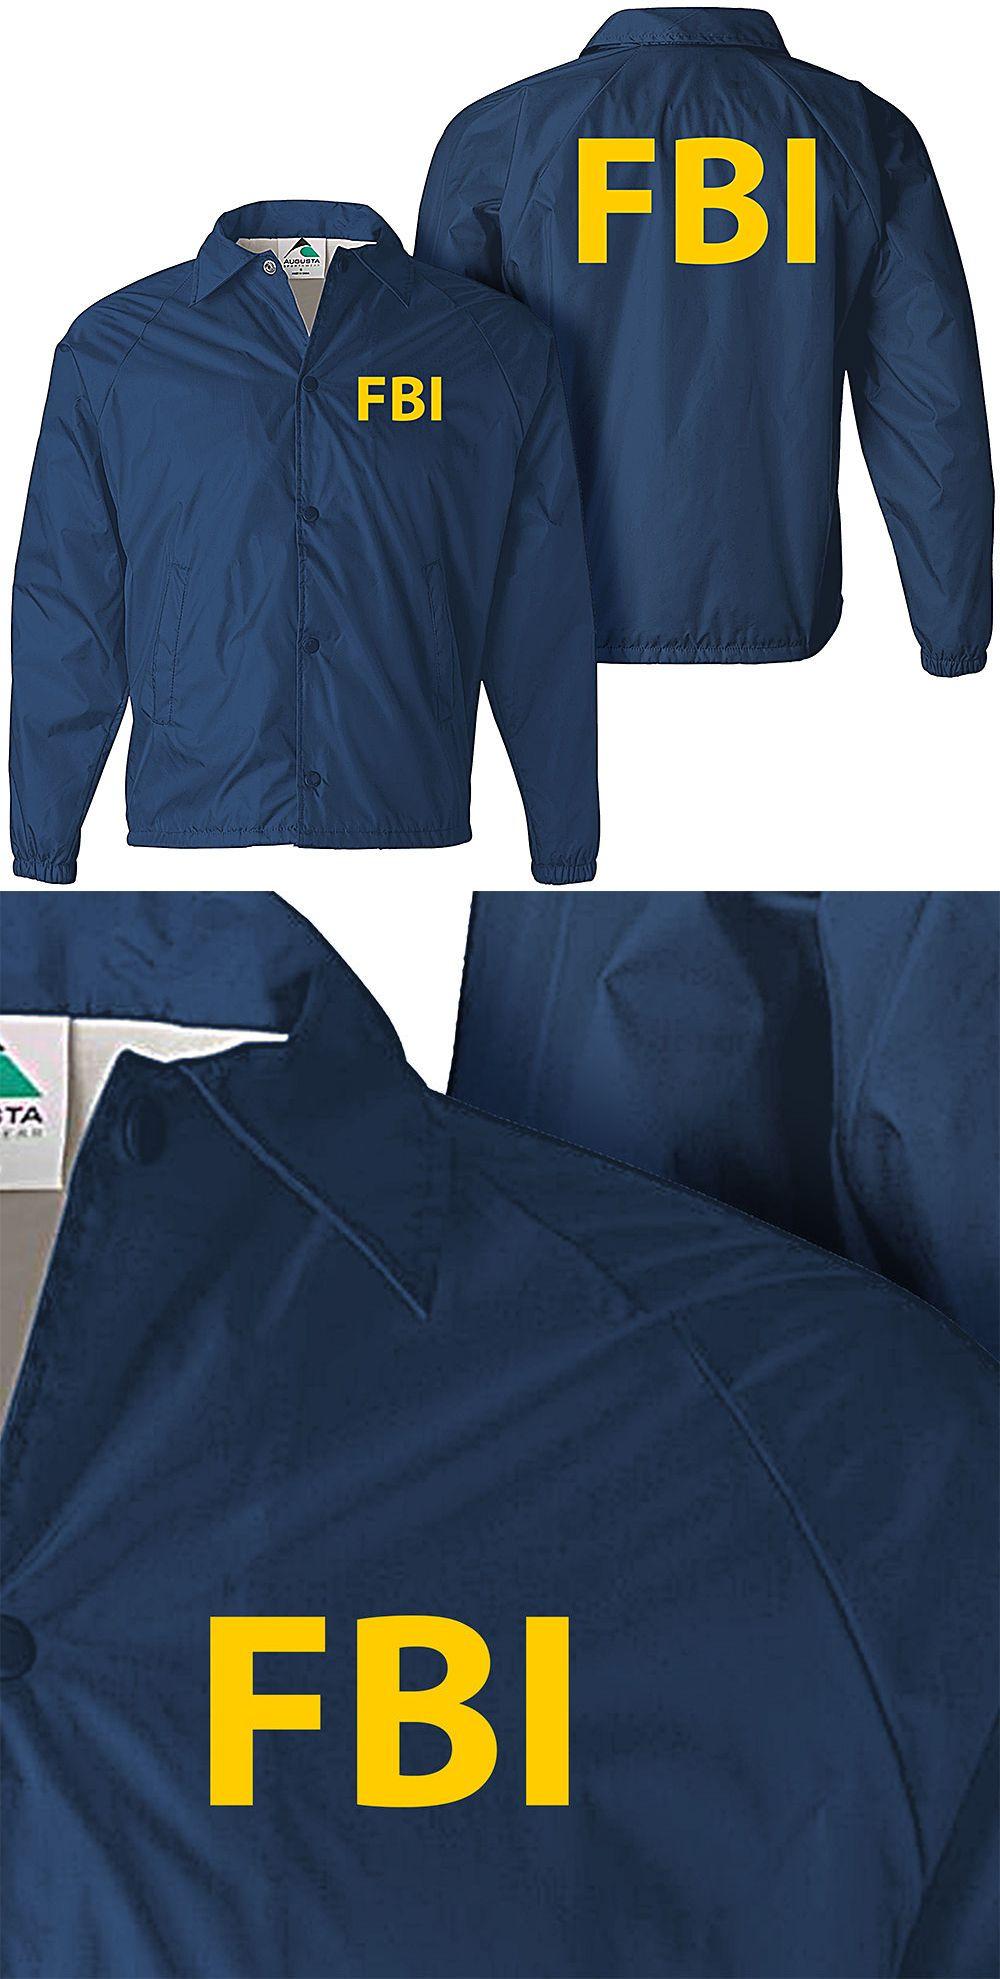 T-Shirts 15687: Fbi Jacket, Government Agent Jacket, Secret Service Jacket,  Police, Cia Jacket -> BUY IT NOW ONLY: $34.95 on eBay!